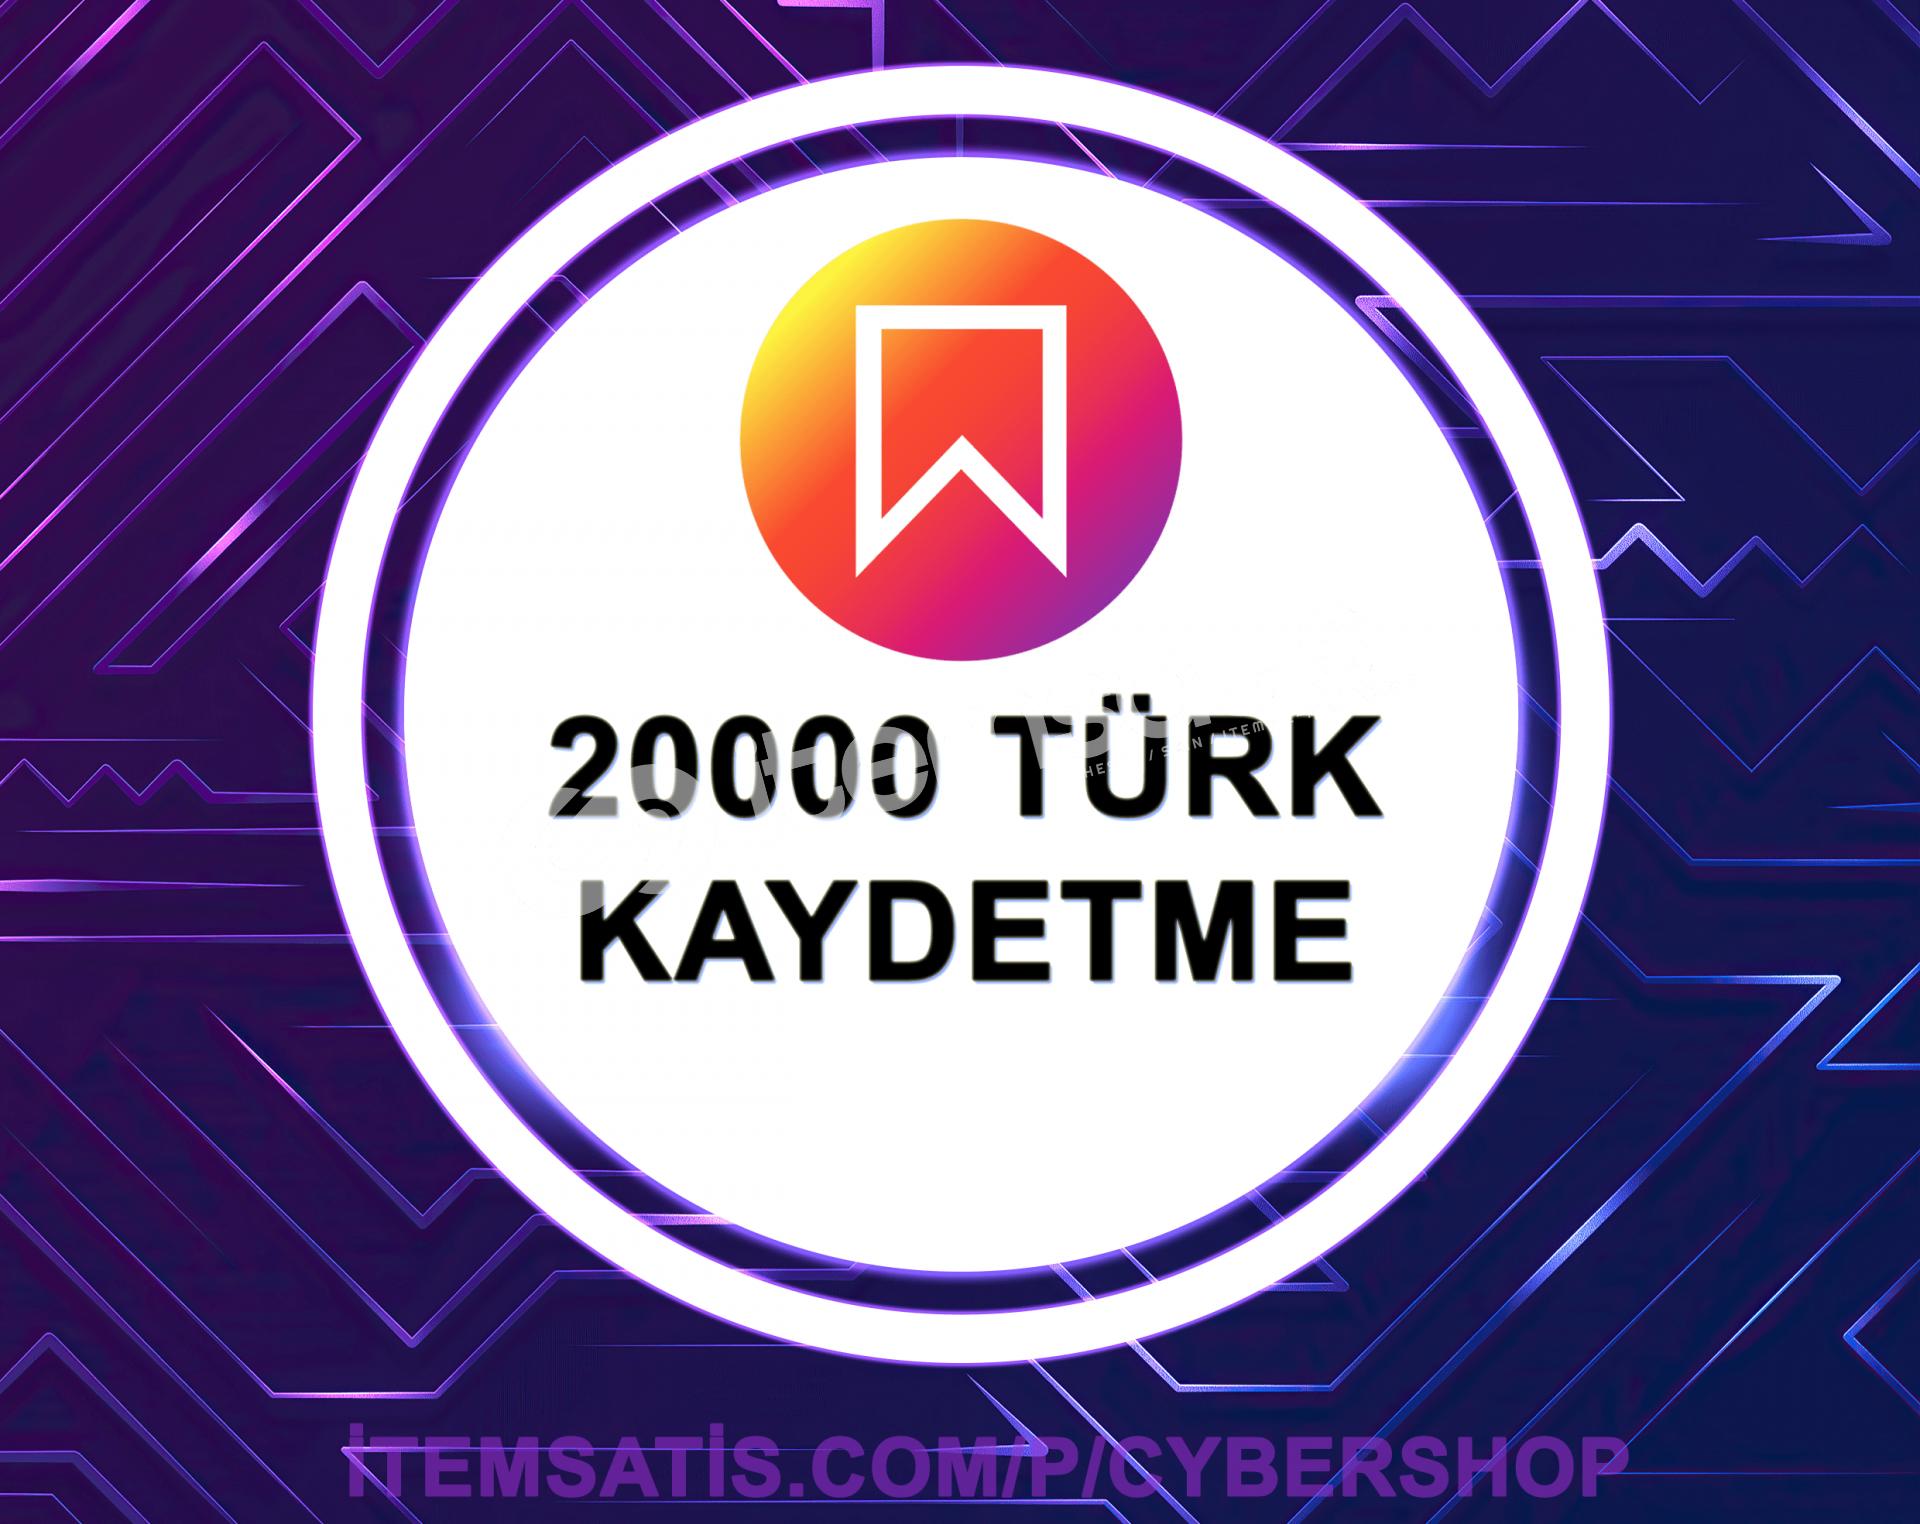 20.000 [TÜRK] Kaydetme Paketi